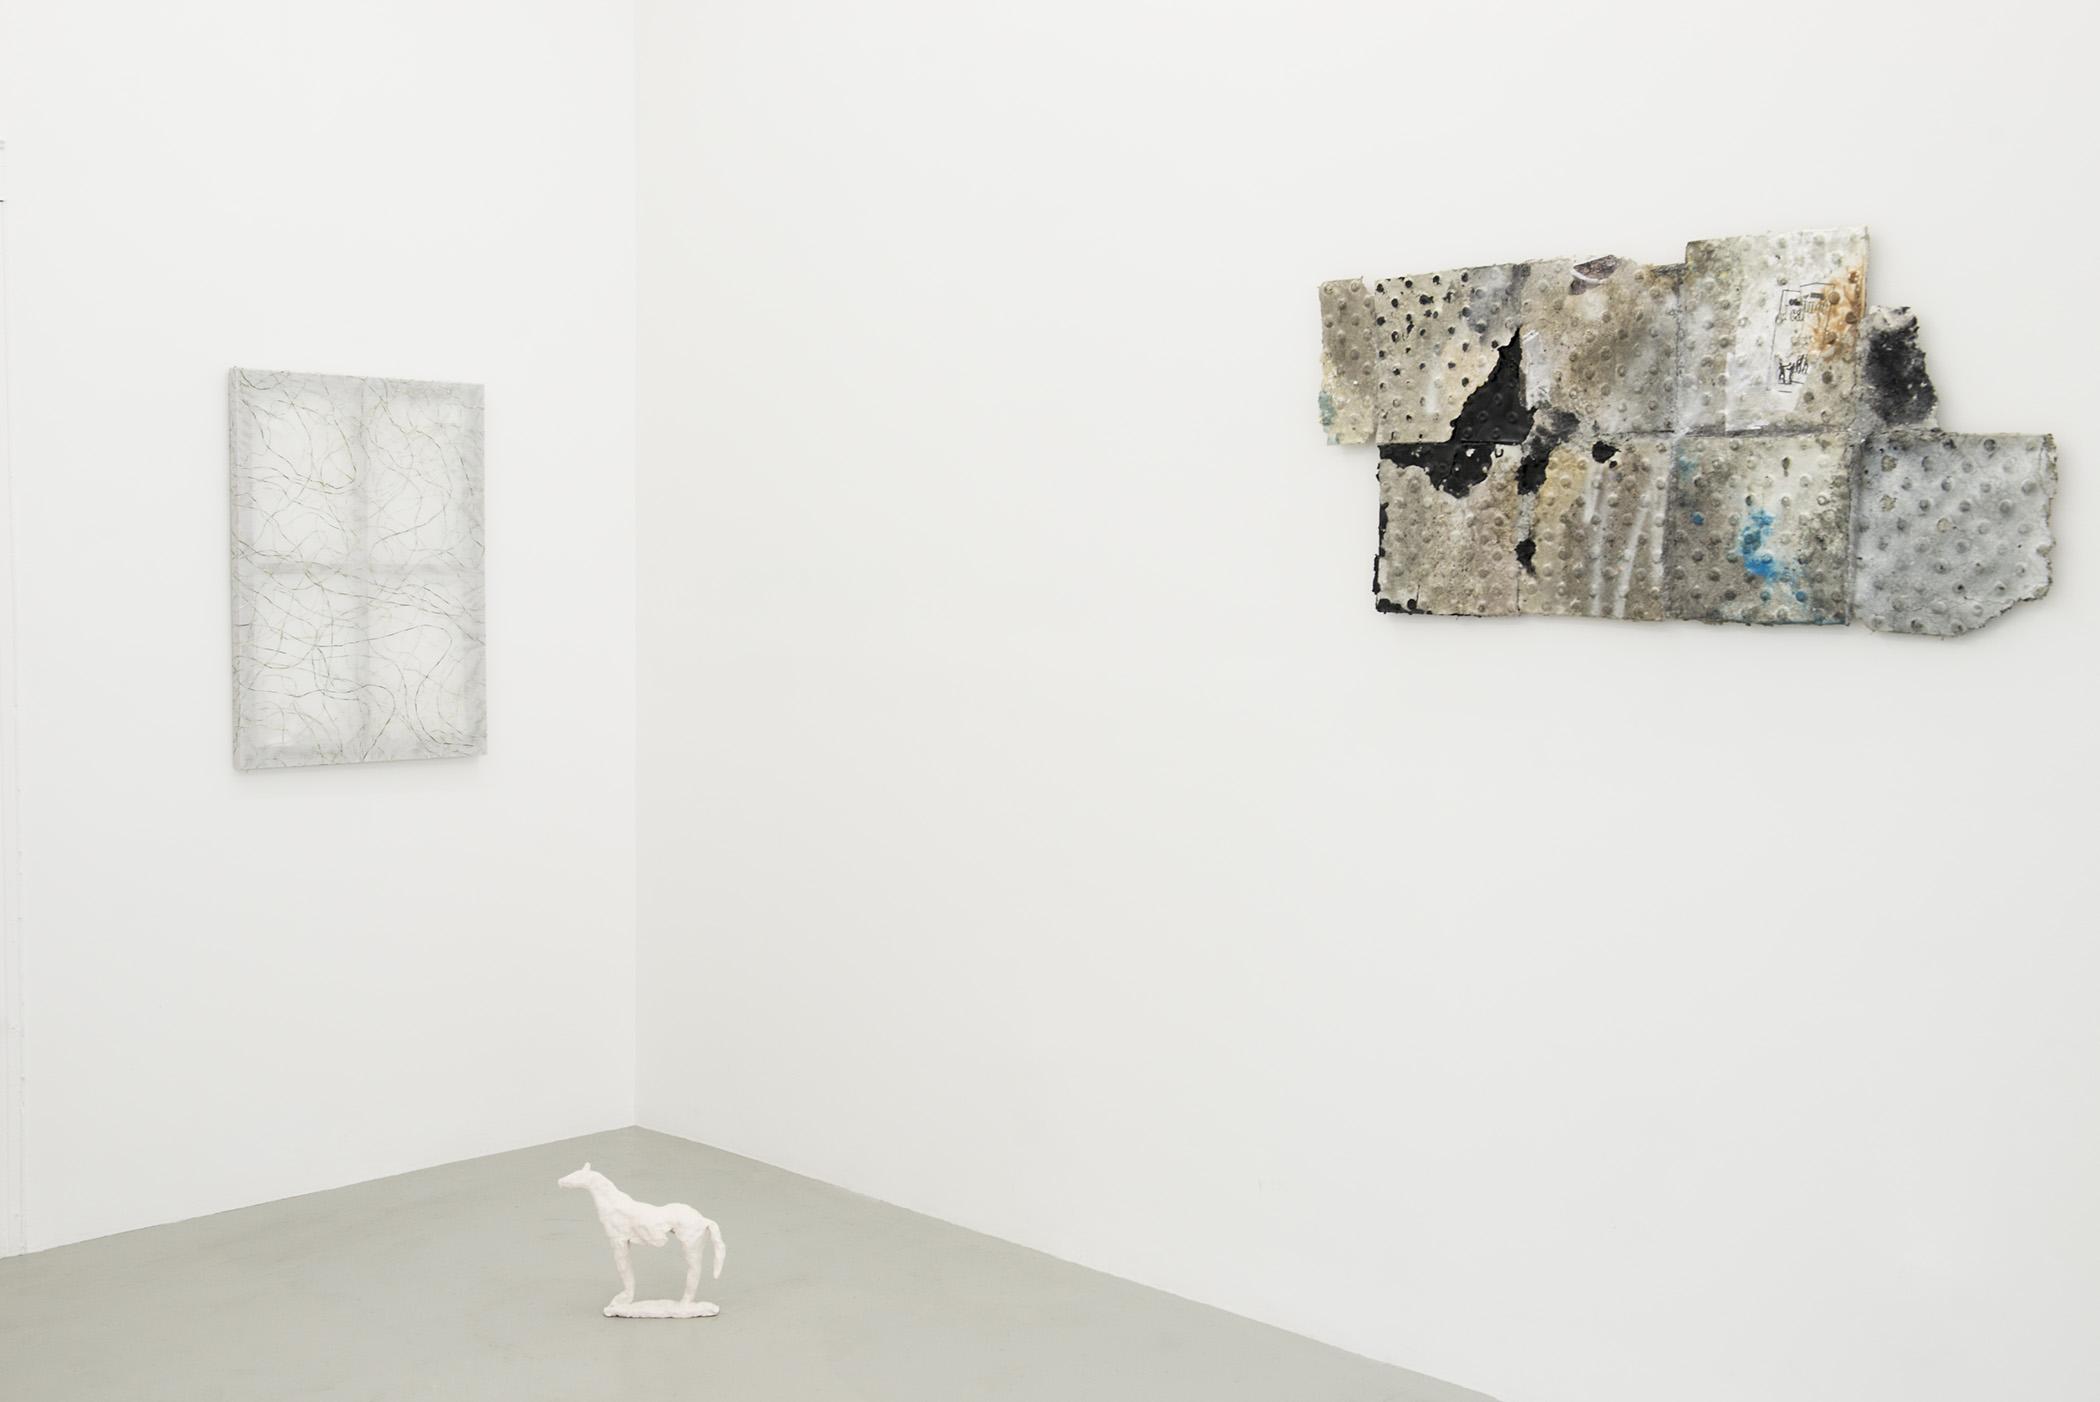 MDCCLXXXIV, 2015 Installation view